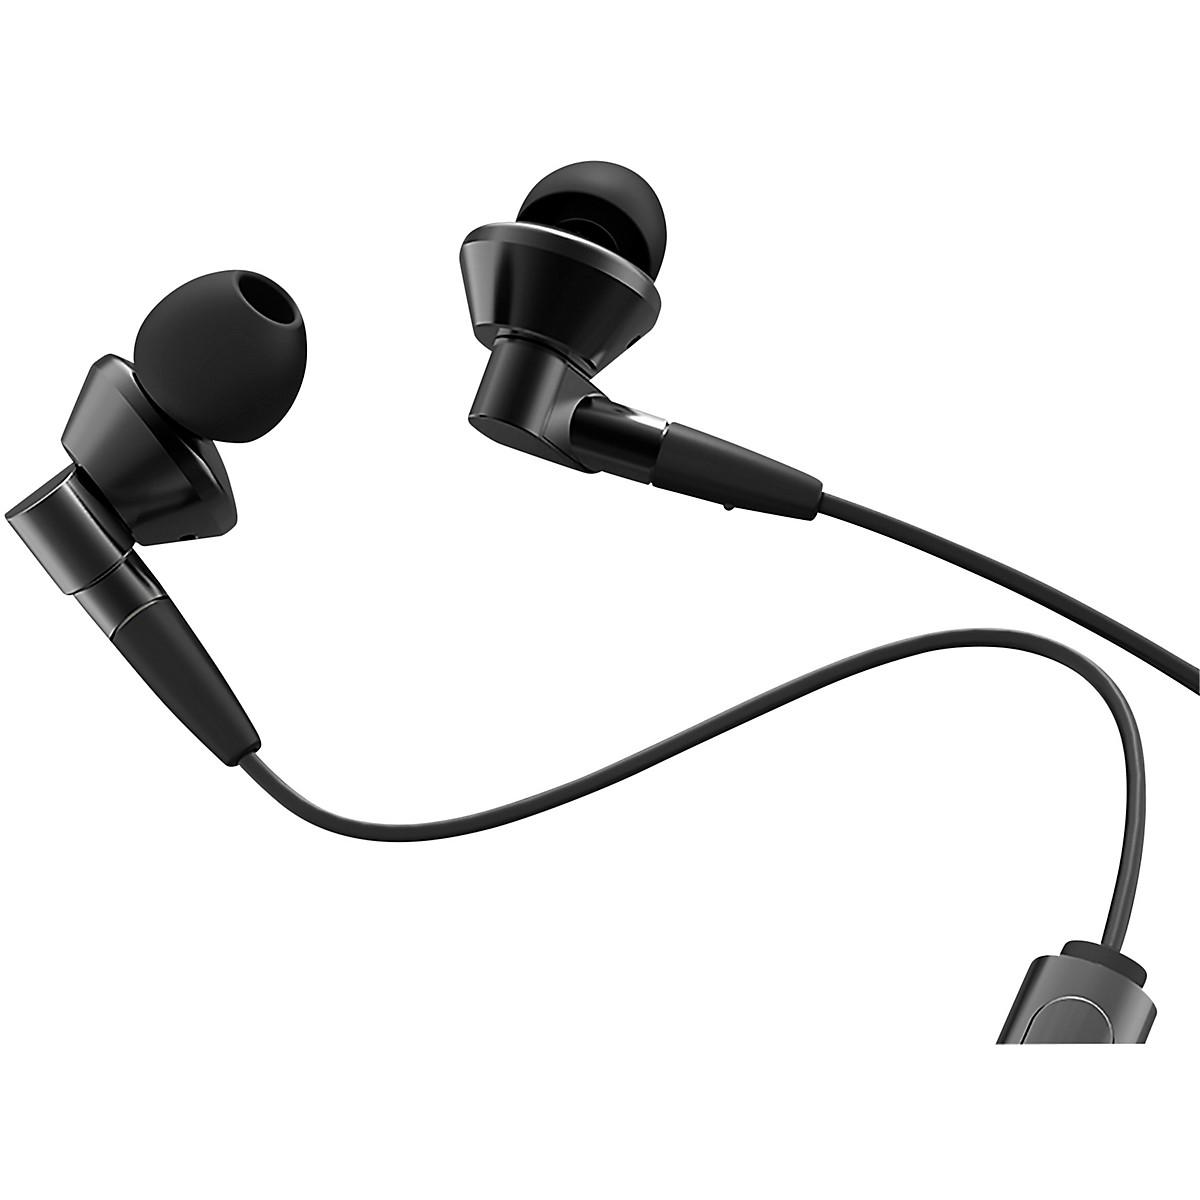 FiiO F5 Balanced In-Ear Monitors With Titanium Diaphragm